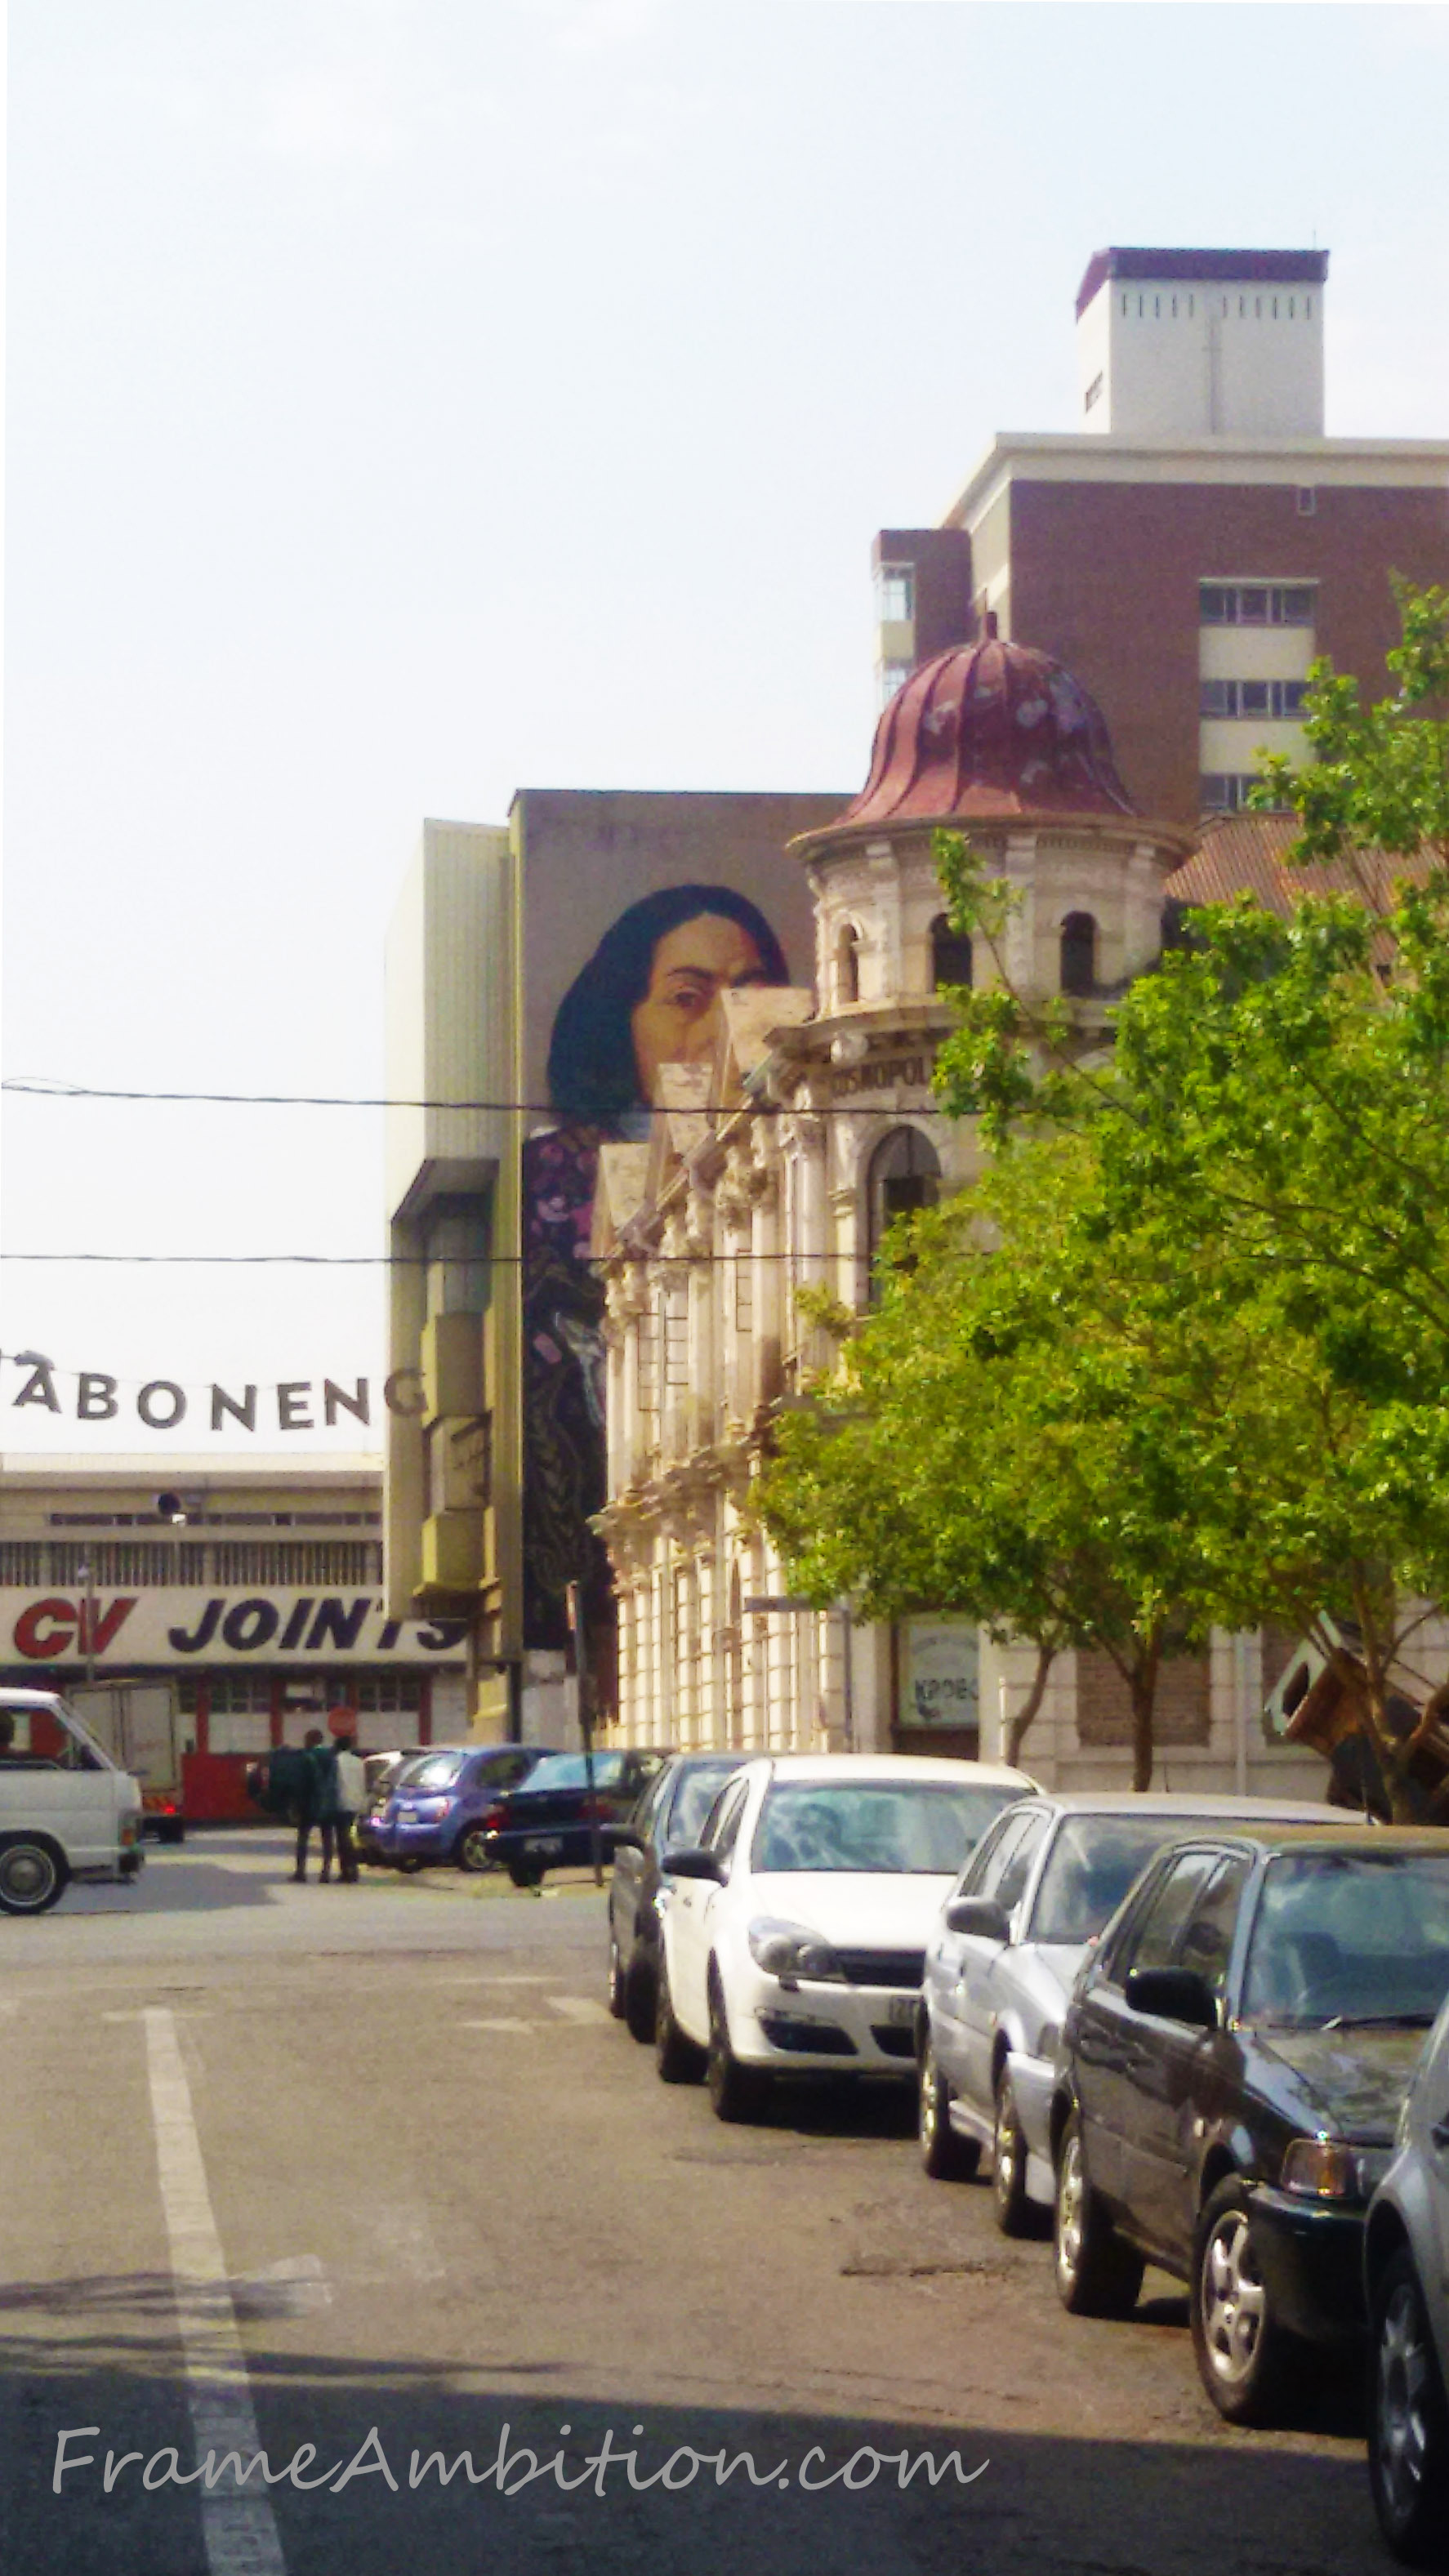 maboneng_street_sign_graffiti_frame_ambition.jpg